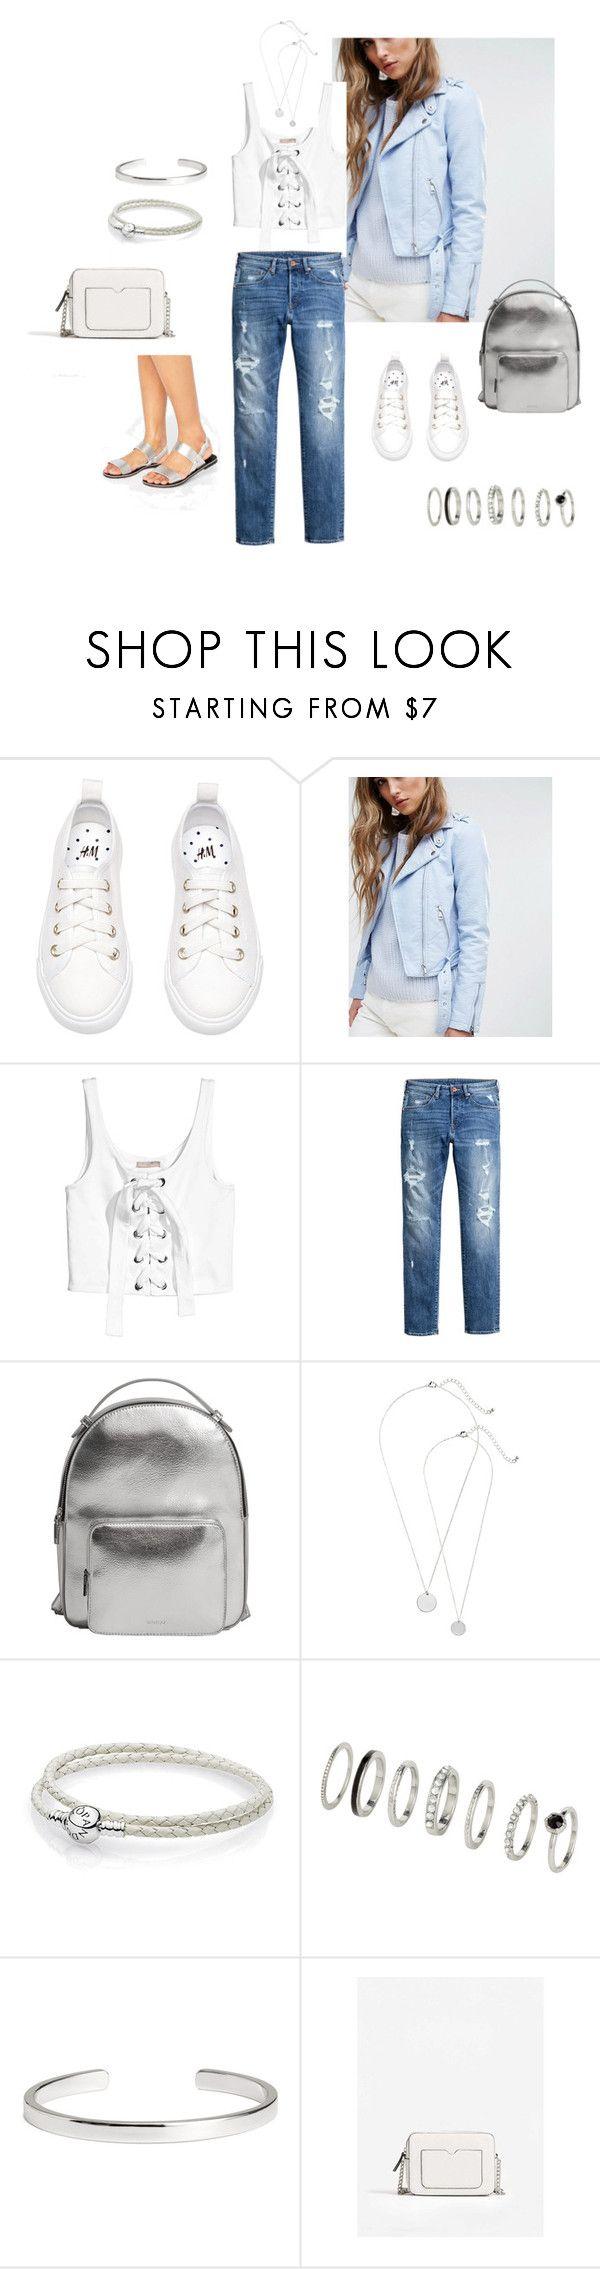 2-1 by tatiana-saksonova on Polyvore featuring мода, Pimkie, Park Lane, MANGO, H&M and Pandora